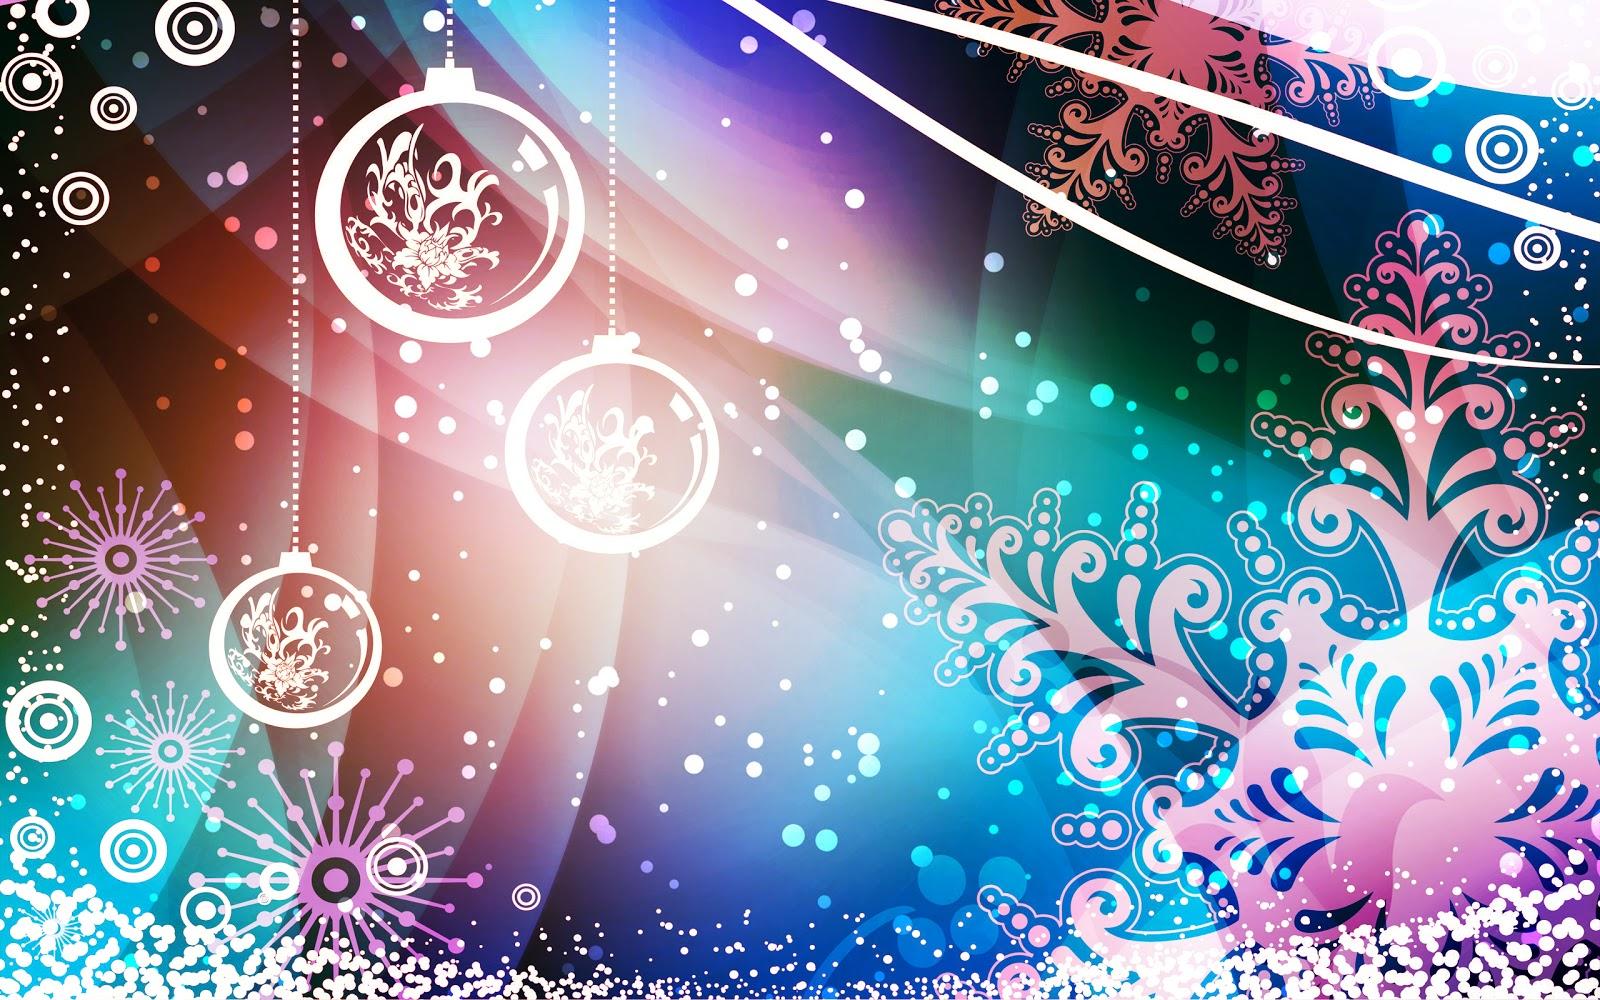 Merry Christmas 2013 Wallpaper:Computer Wallpaper | Free ...